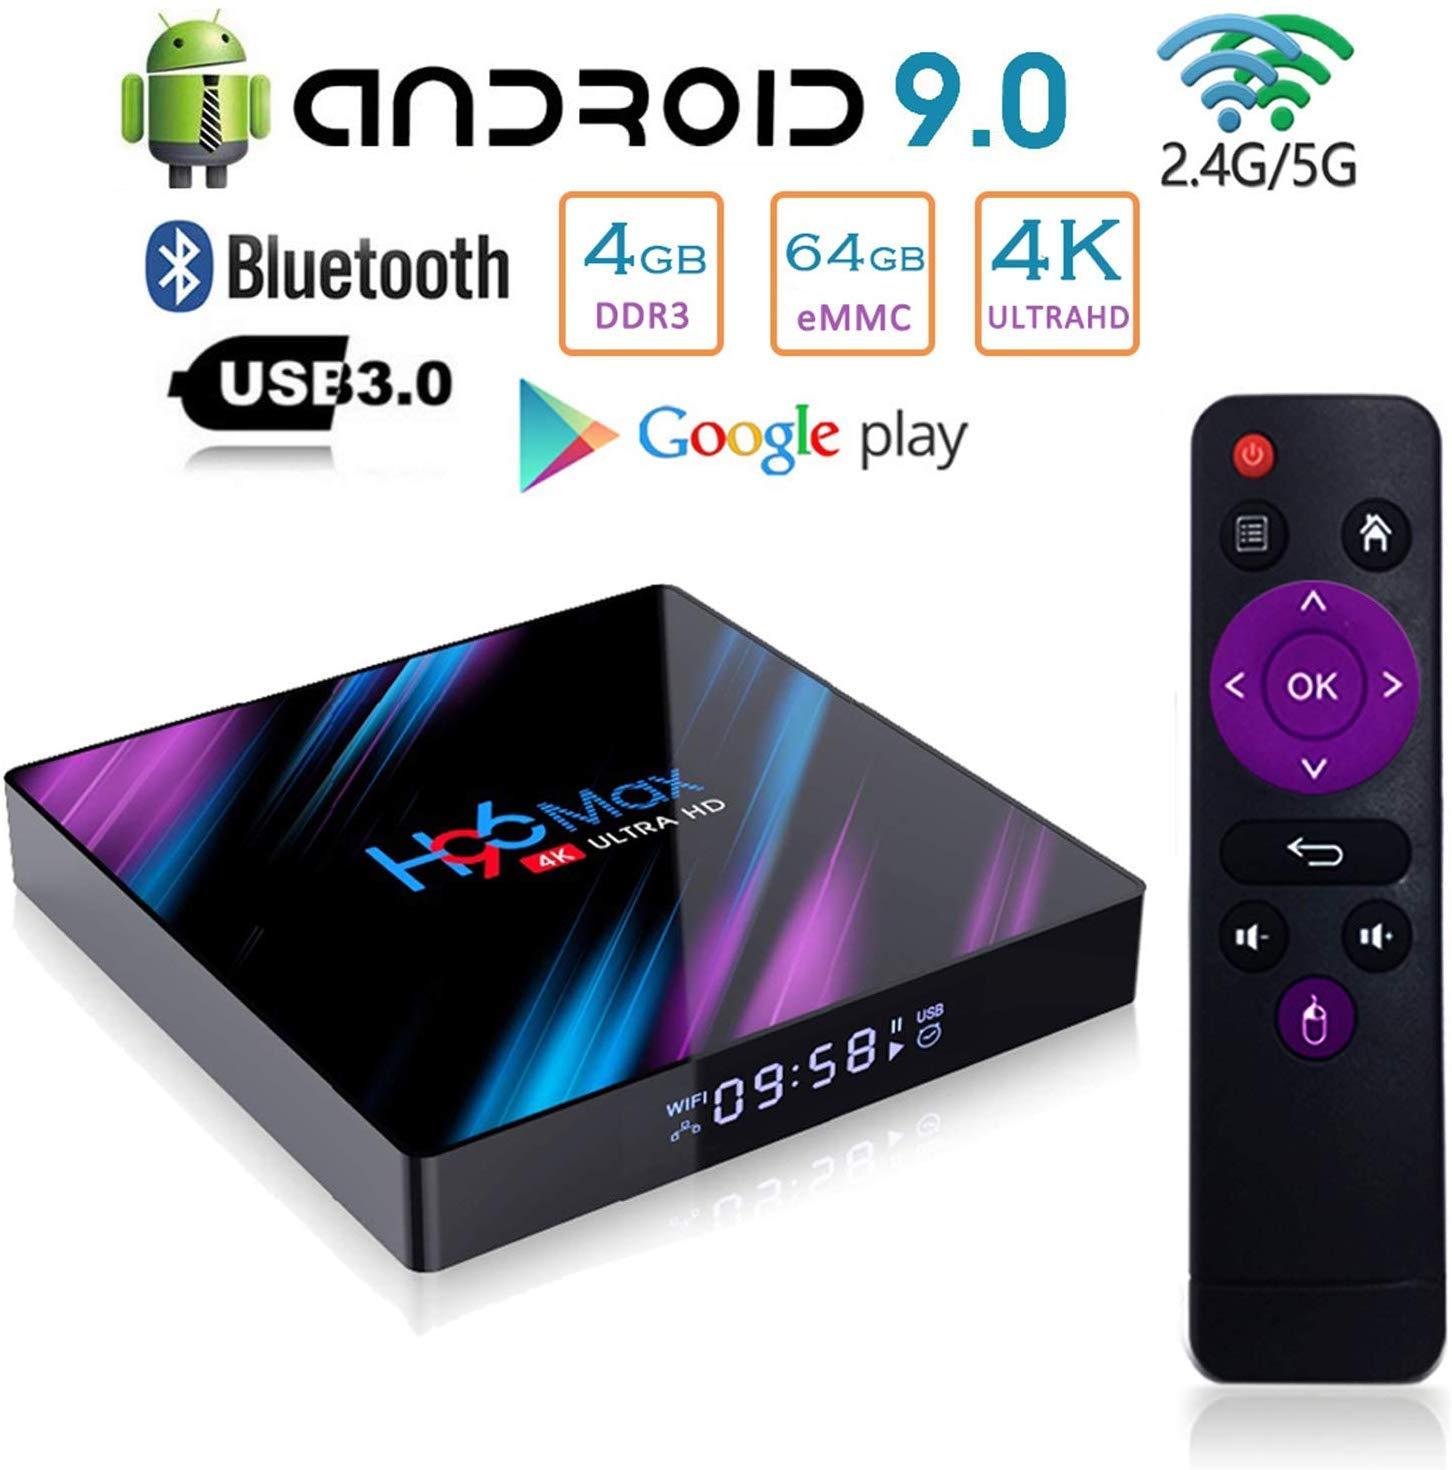 Android 9.0 TV Box,H96 MAX Android Box RK3318 Quad-Core 64bit Cortex-A53,4GB RAM